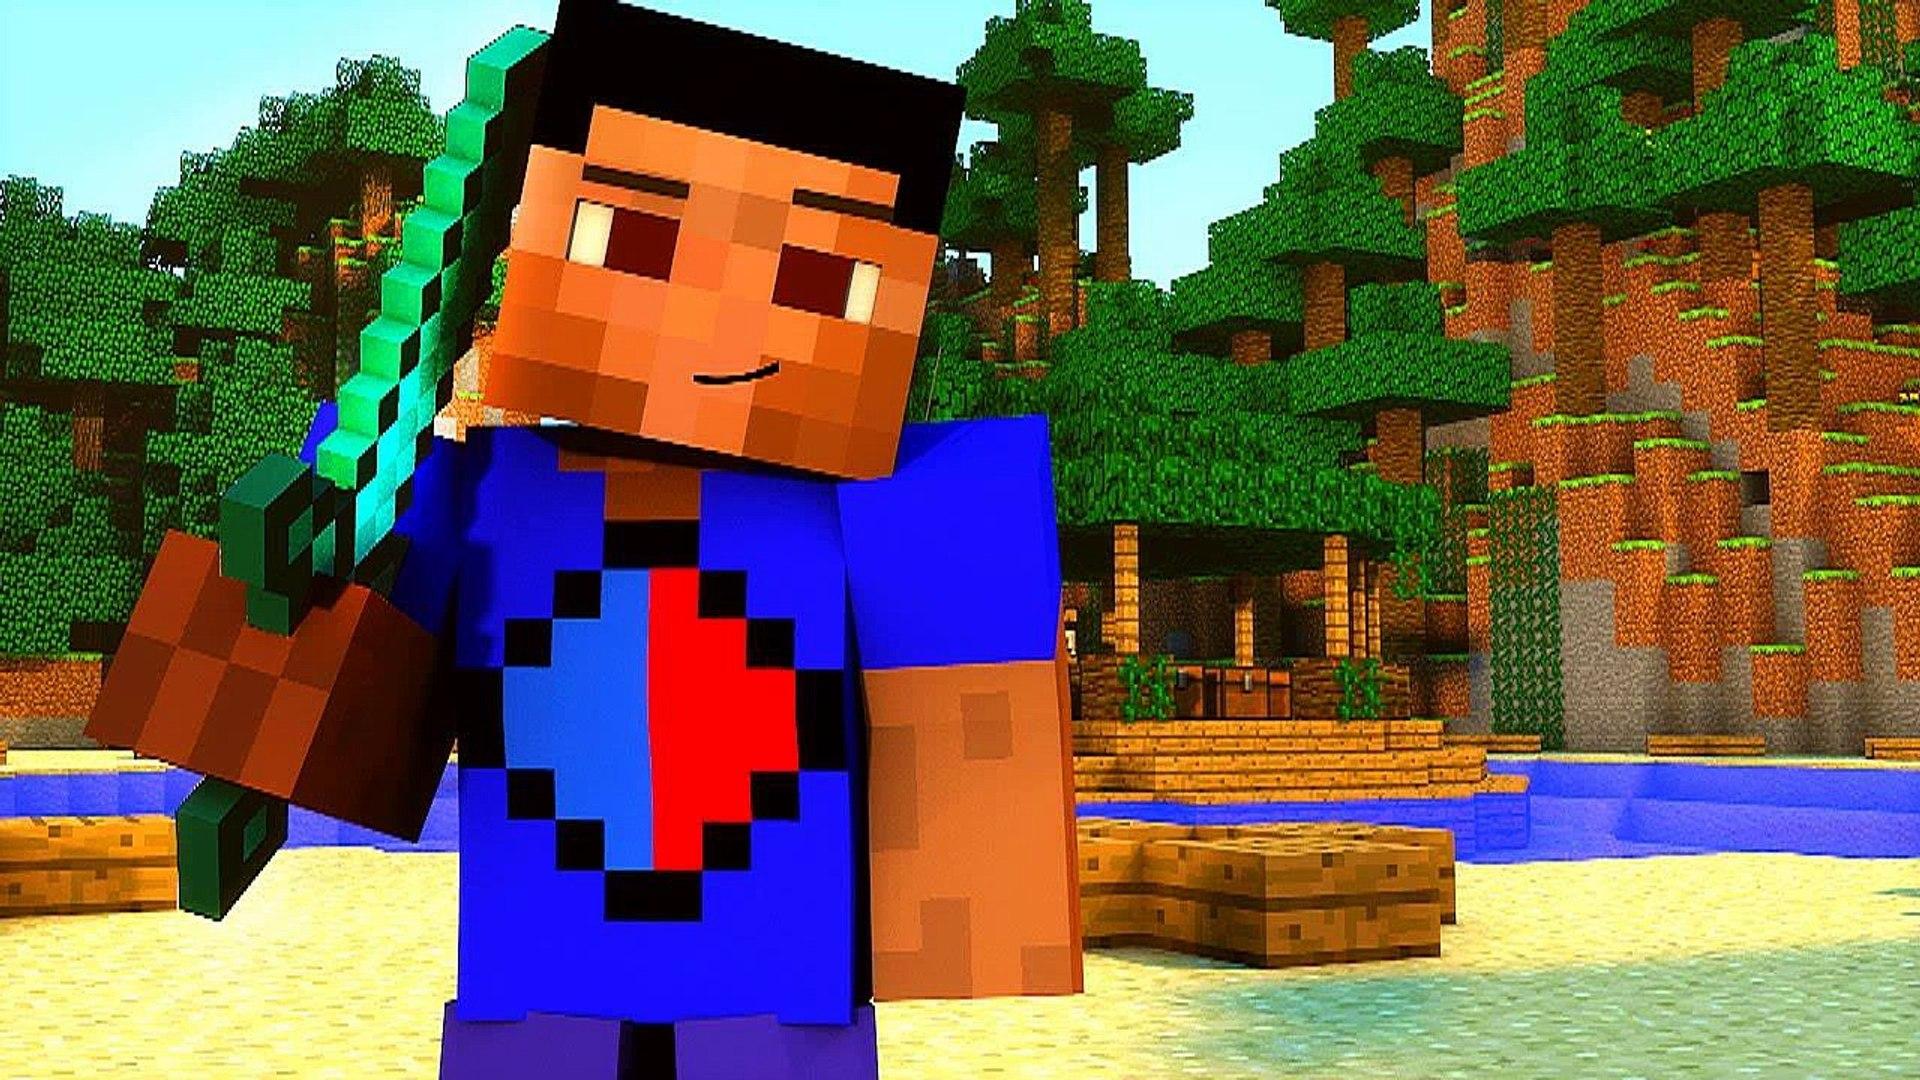 Top 10 Minecraft Song August 2015 Best Minecraft Songs Animations Parody Parodies - Minecraft Song